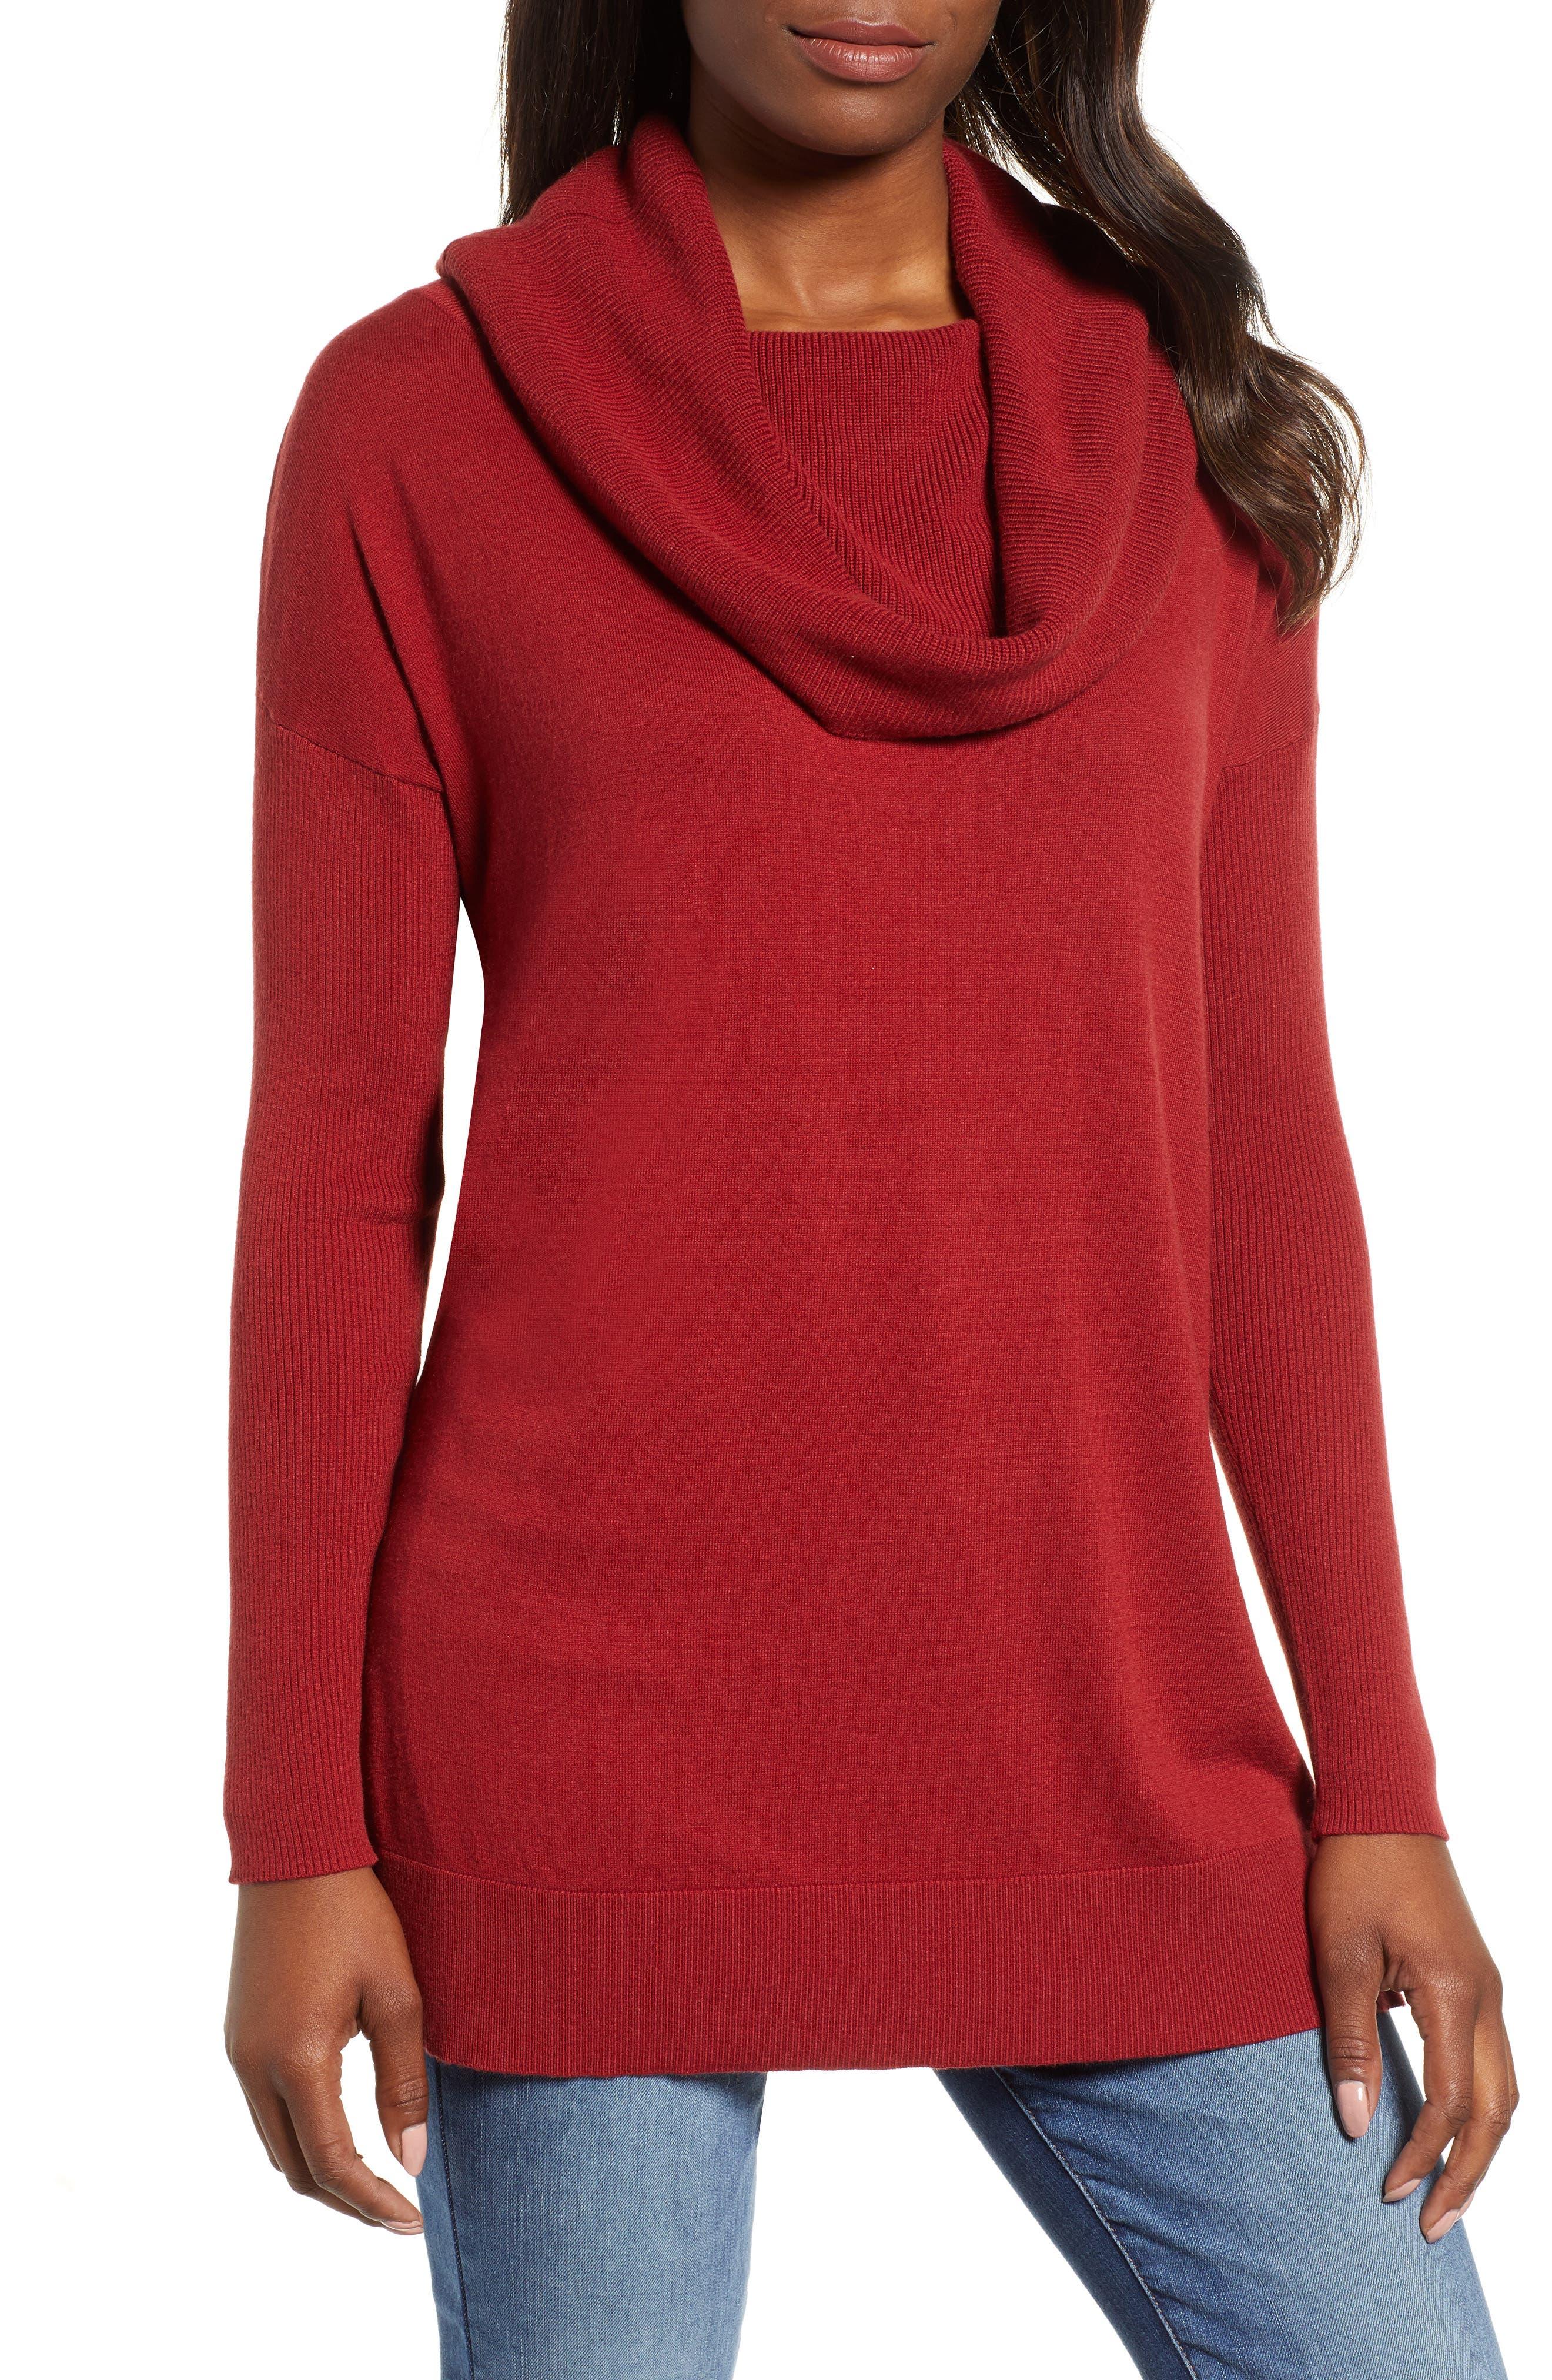 836c5373393e0 Women s Sweaters